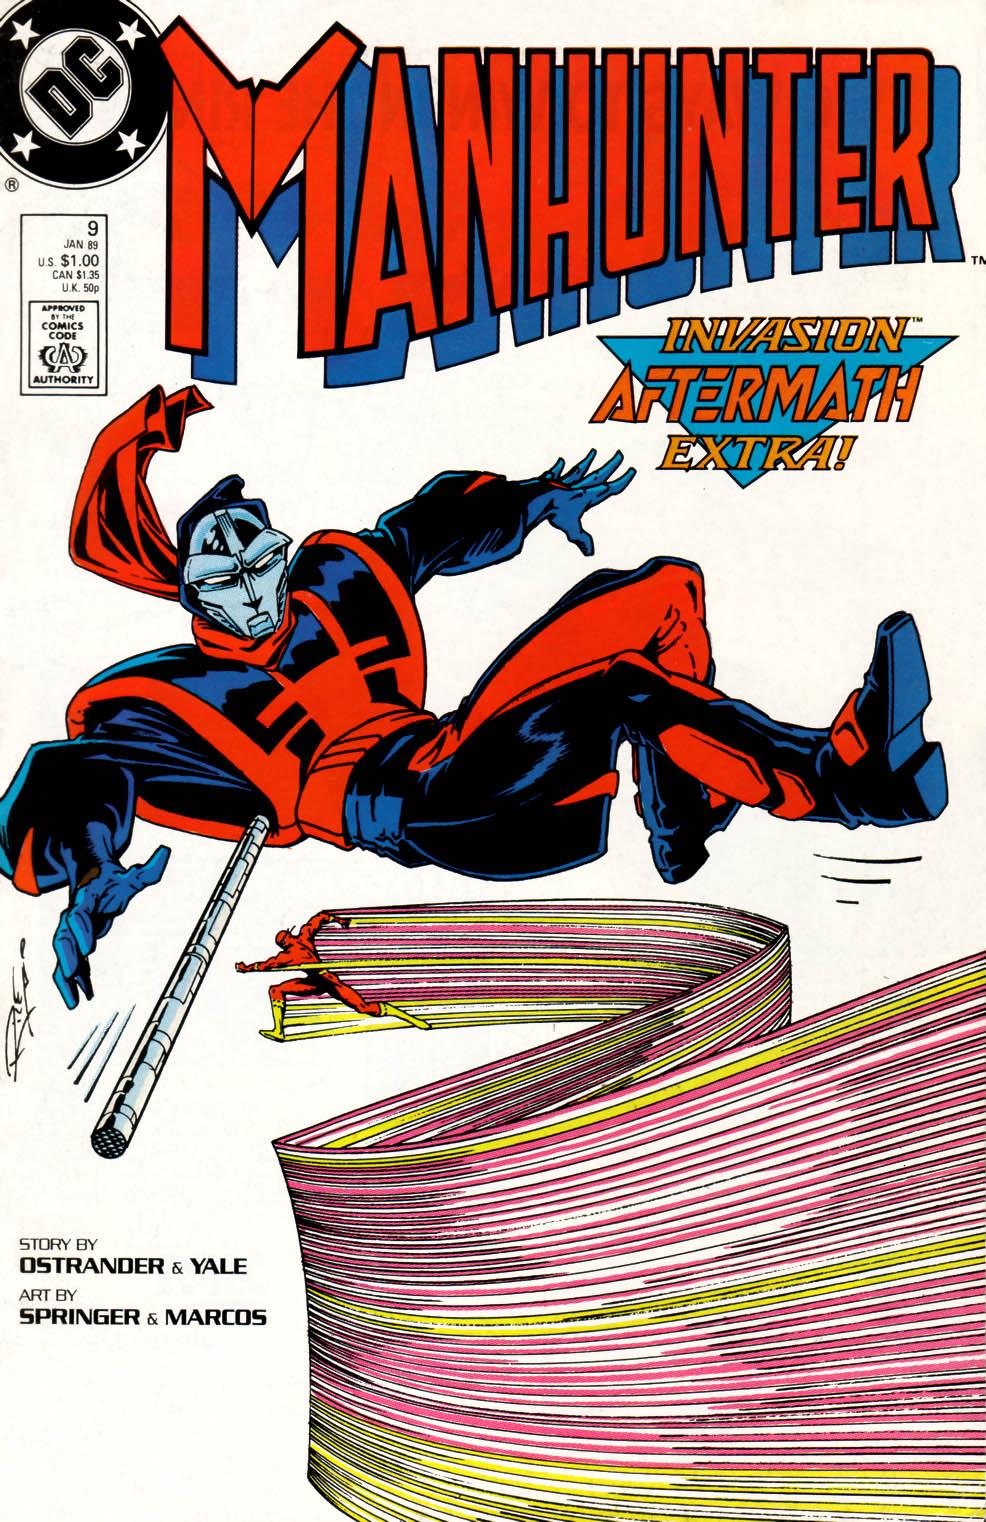 Manhunter (1988) issue 9 - Page 1